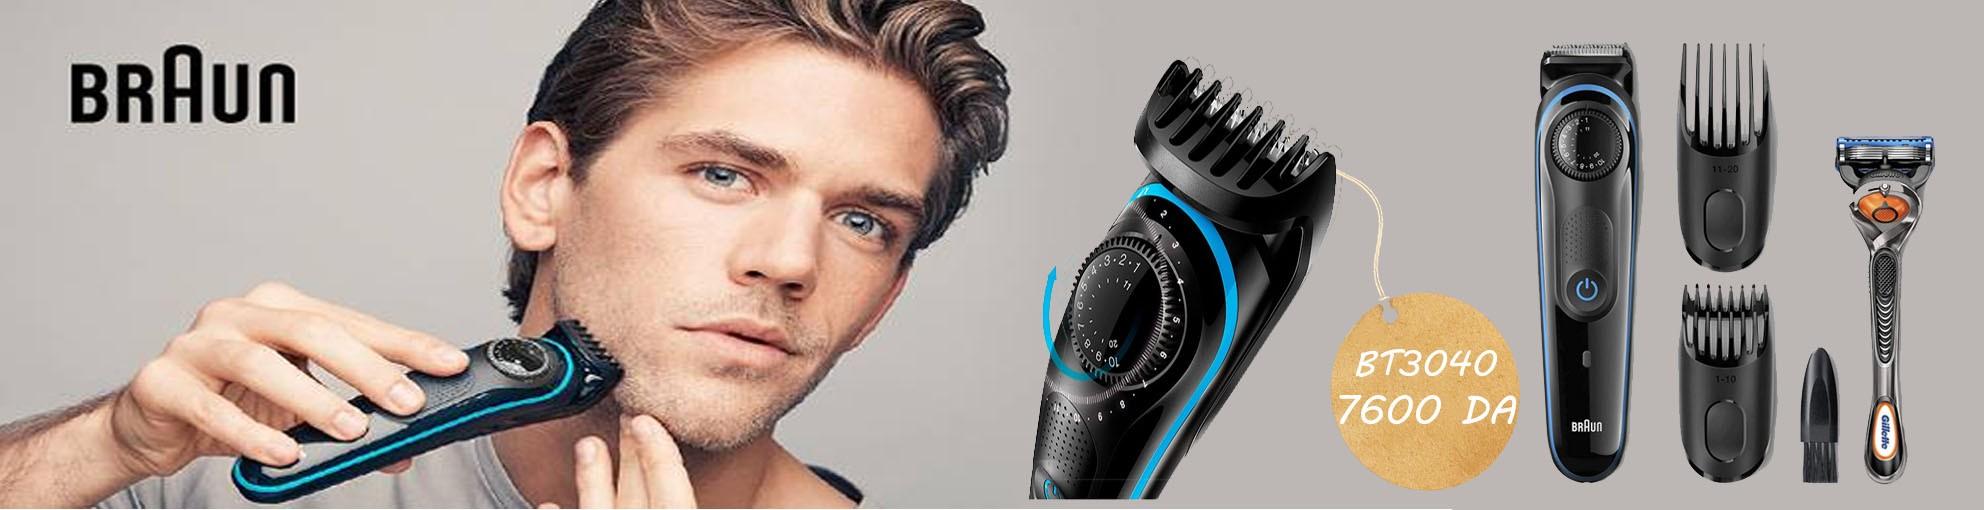 Braun Tondeuse à barbe BT3040